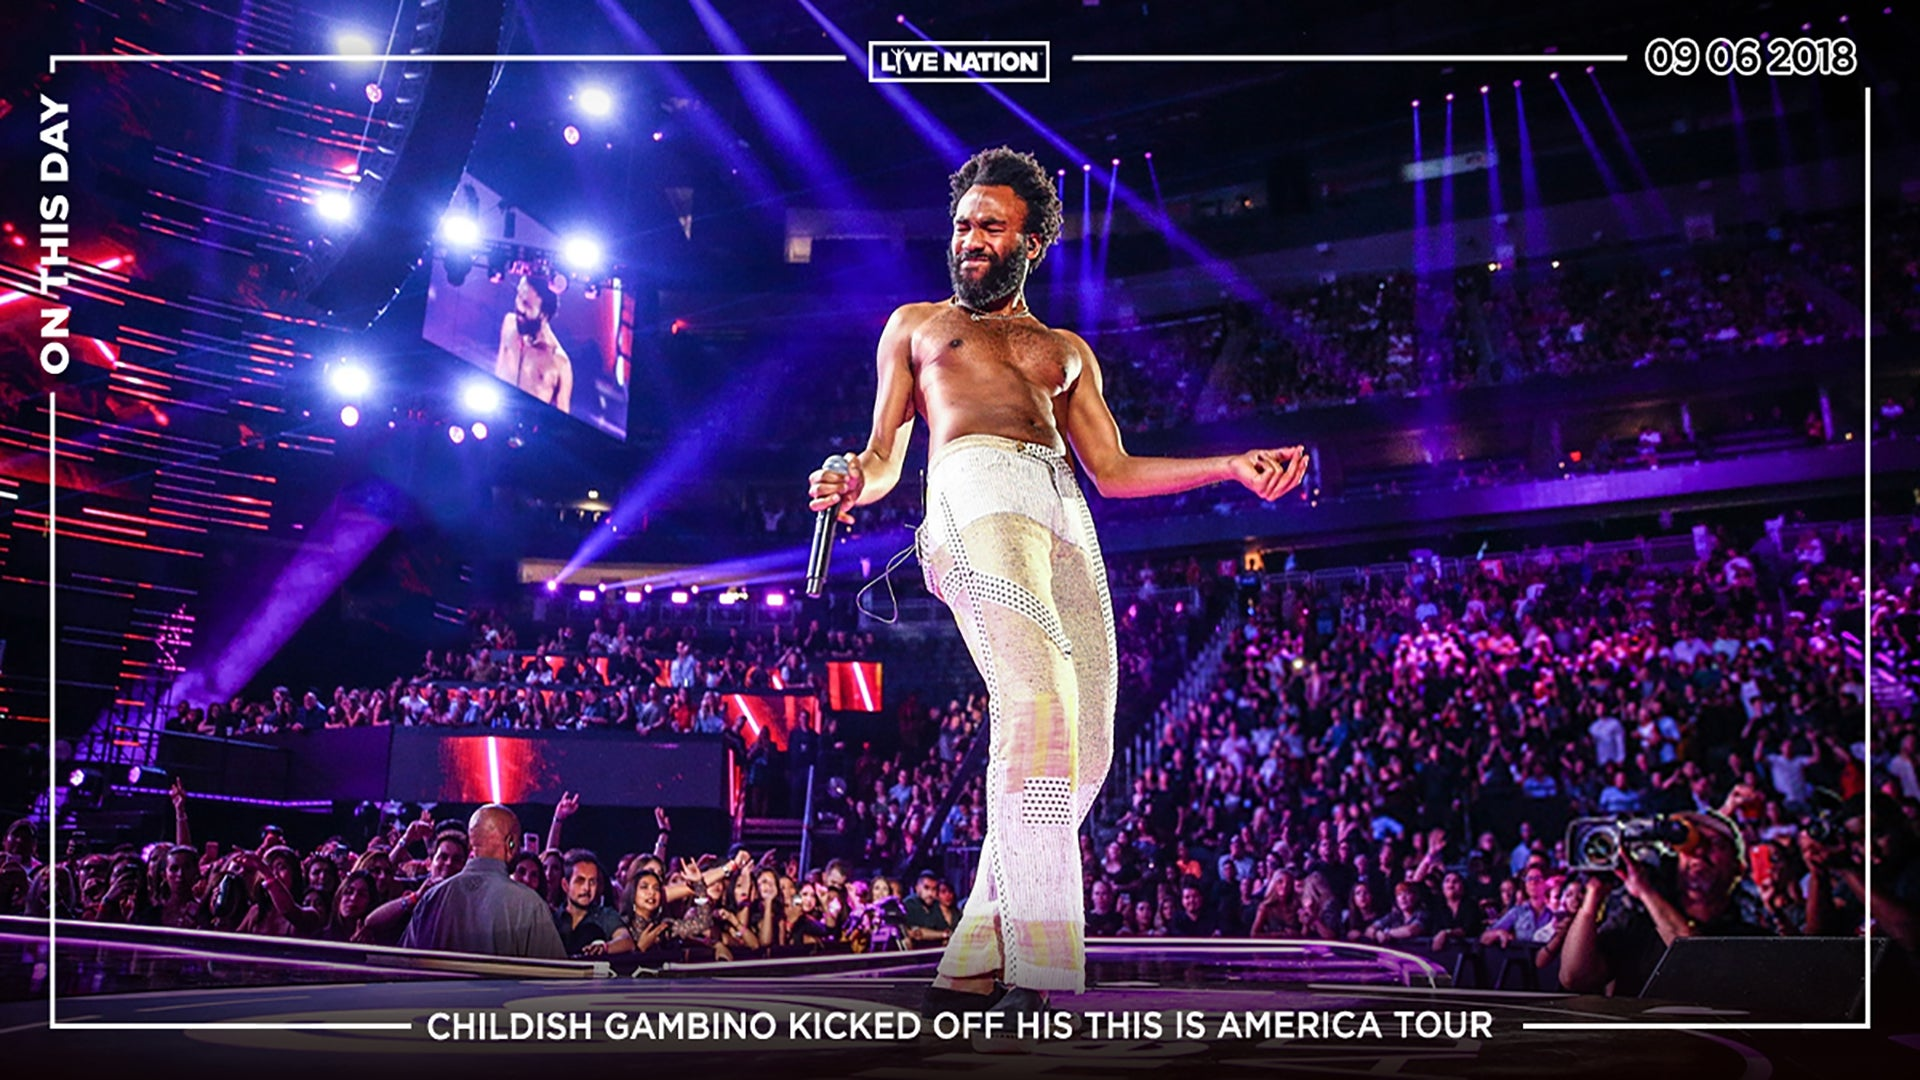 On This Day - Childish Gambino This Is America Tour